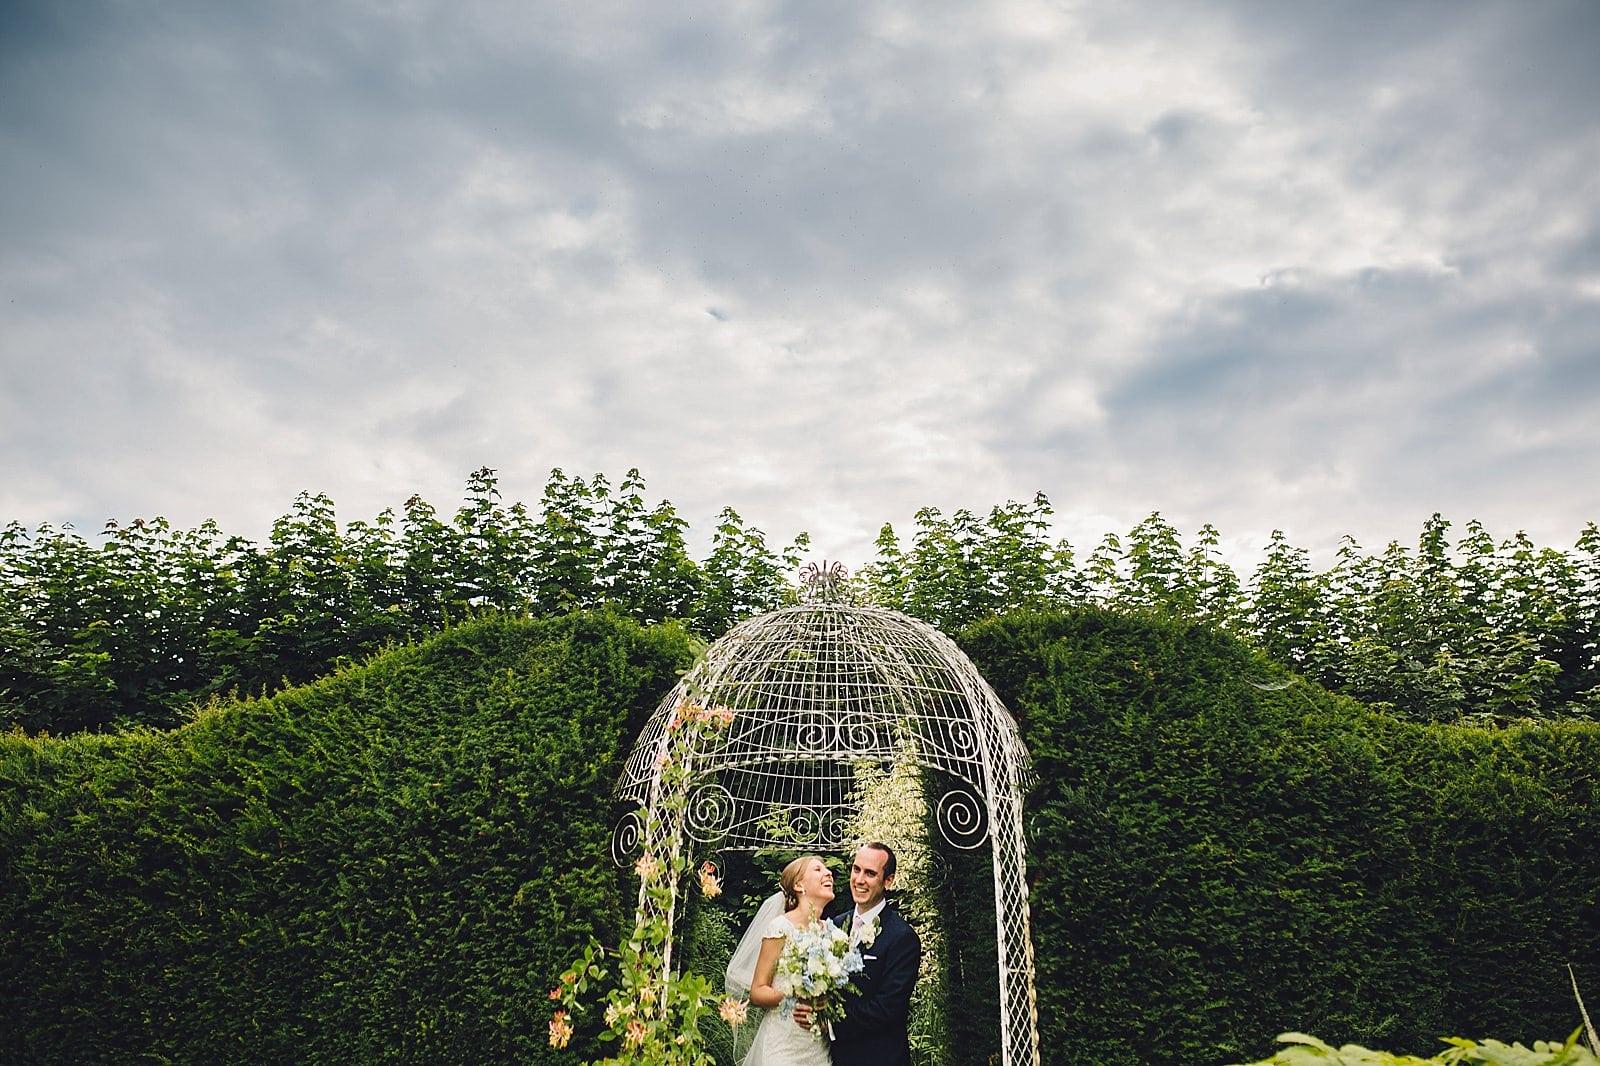 sutton-bonington-hall-wedding-photography_0098